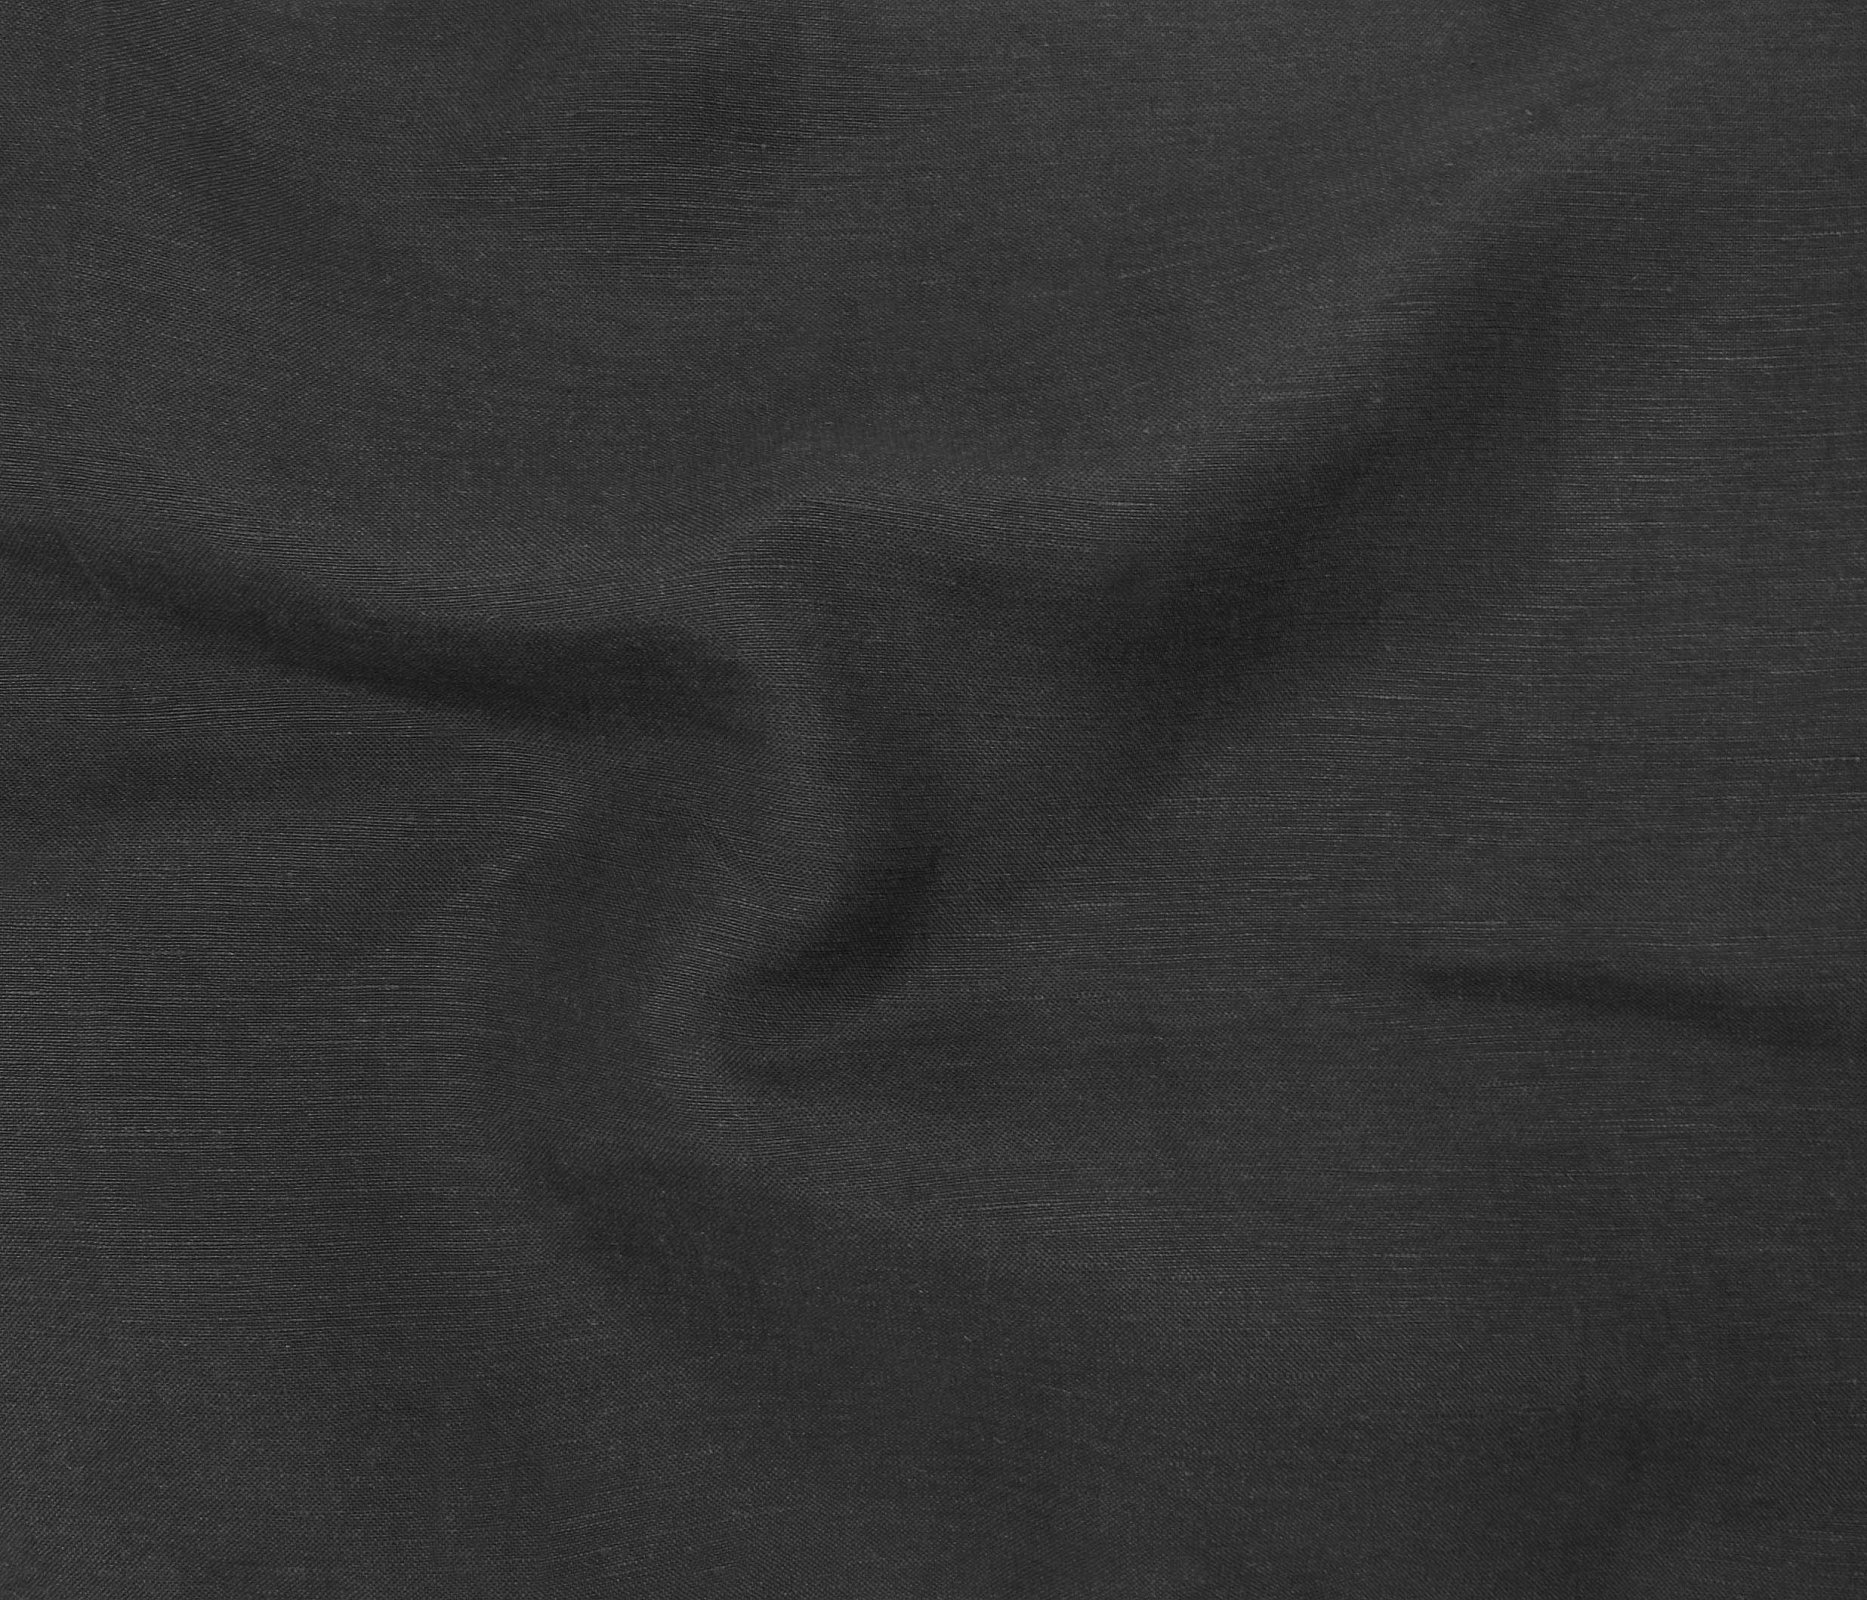 b214a23c016 Cezanne Linen Viscose - Black